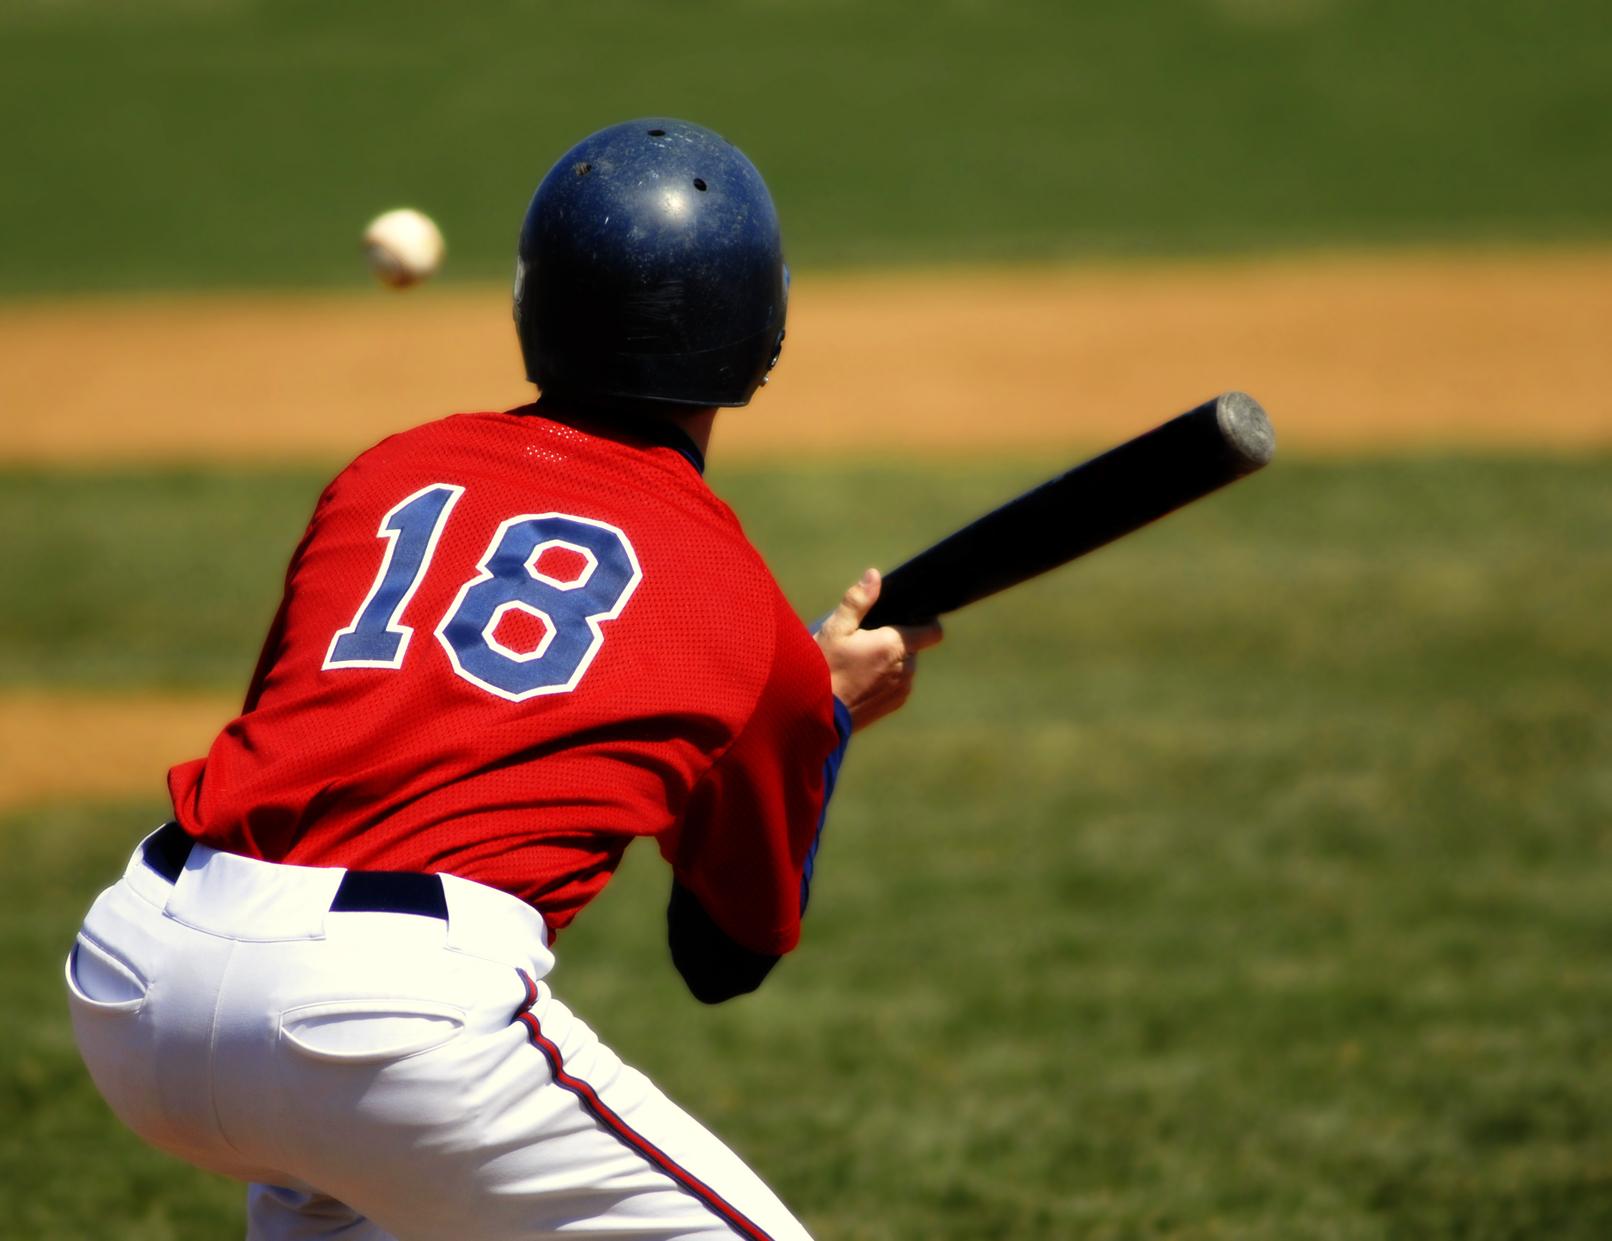 baseball skills clinics